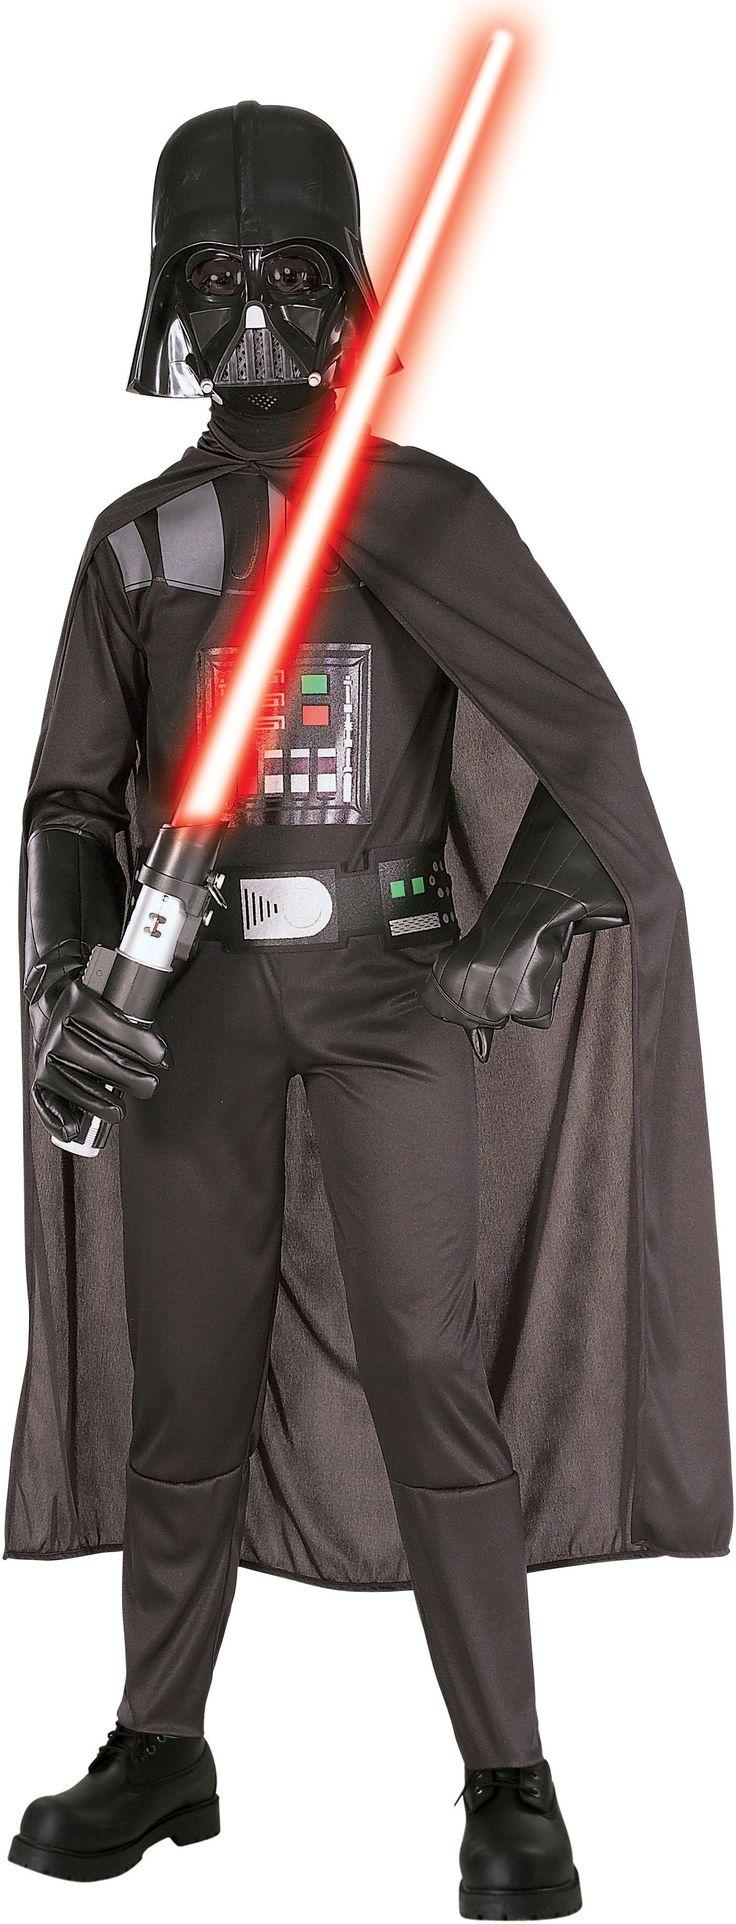 Top 25+ Best Darth Vader Face Ideas On Pinterest